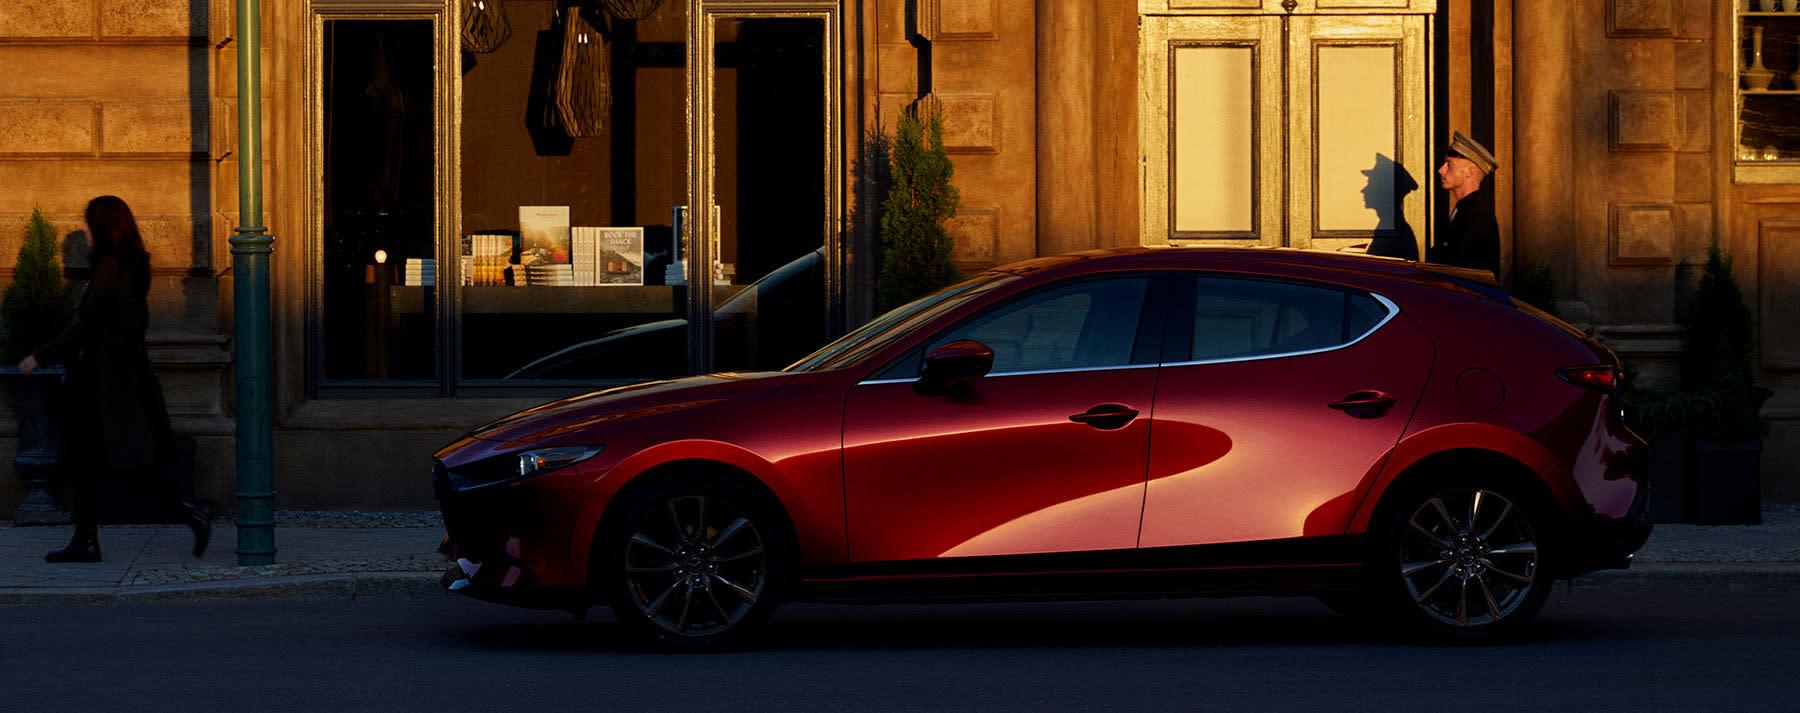 2020 Mazda3 Hatchback for Sale near Sacramento, CA